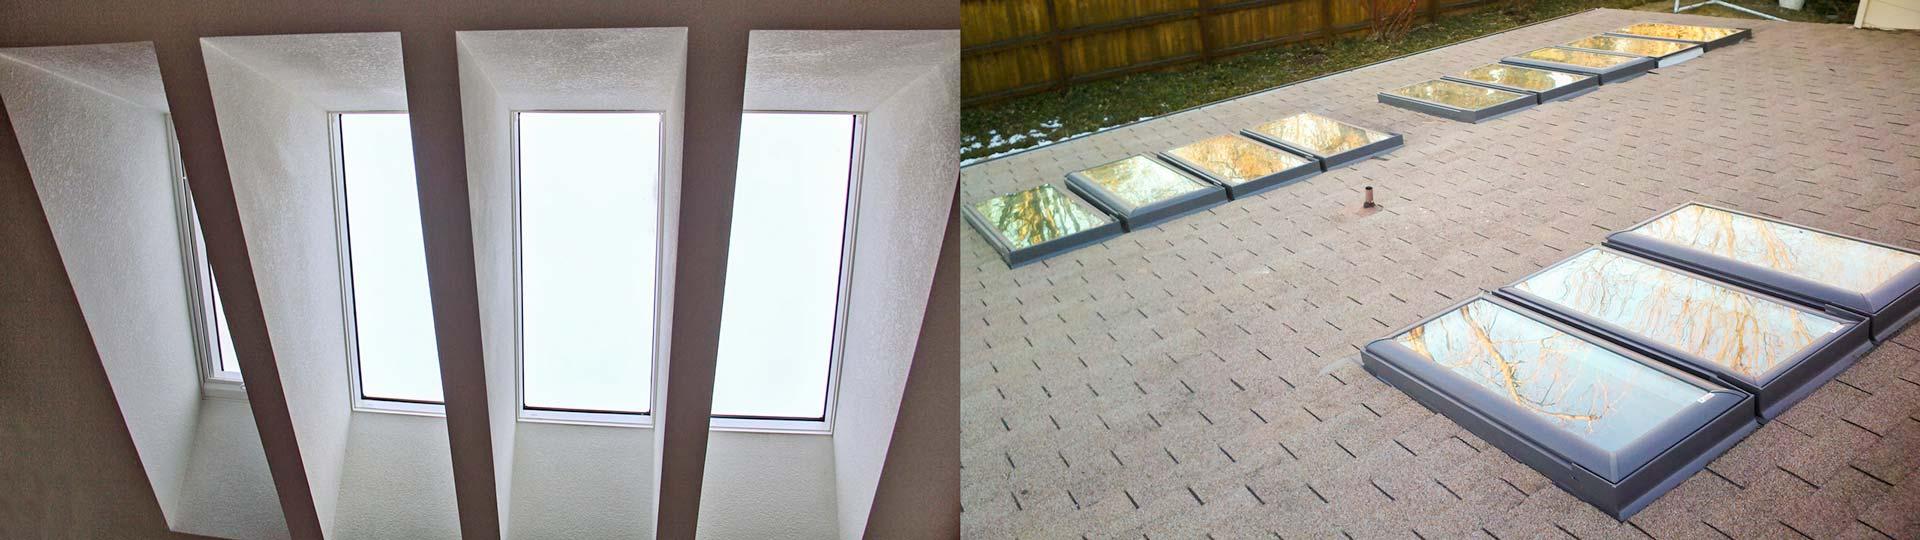 skylight shaft 4x1 wrapped 18240